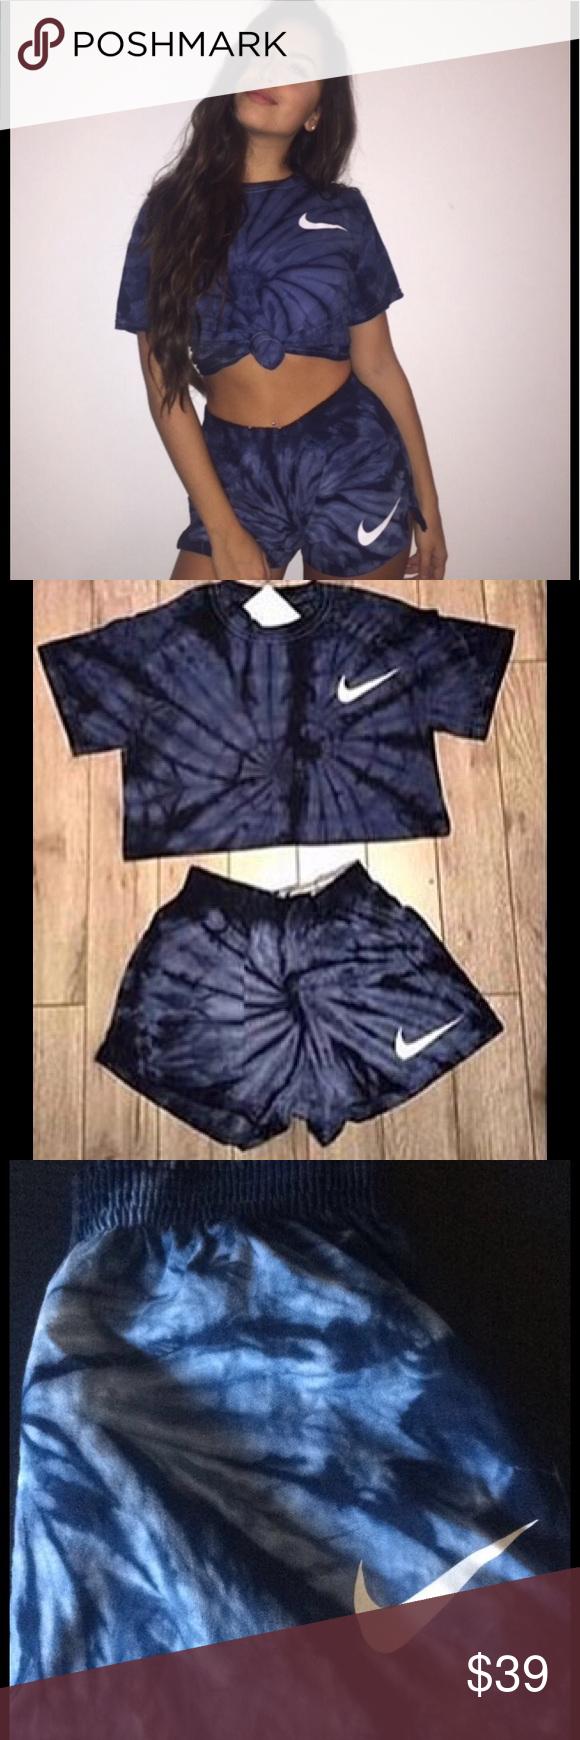 Nike Tie Dye matching set   Tie dye